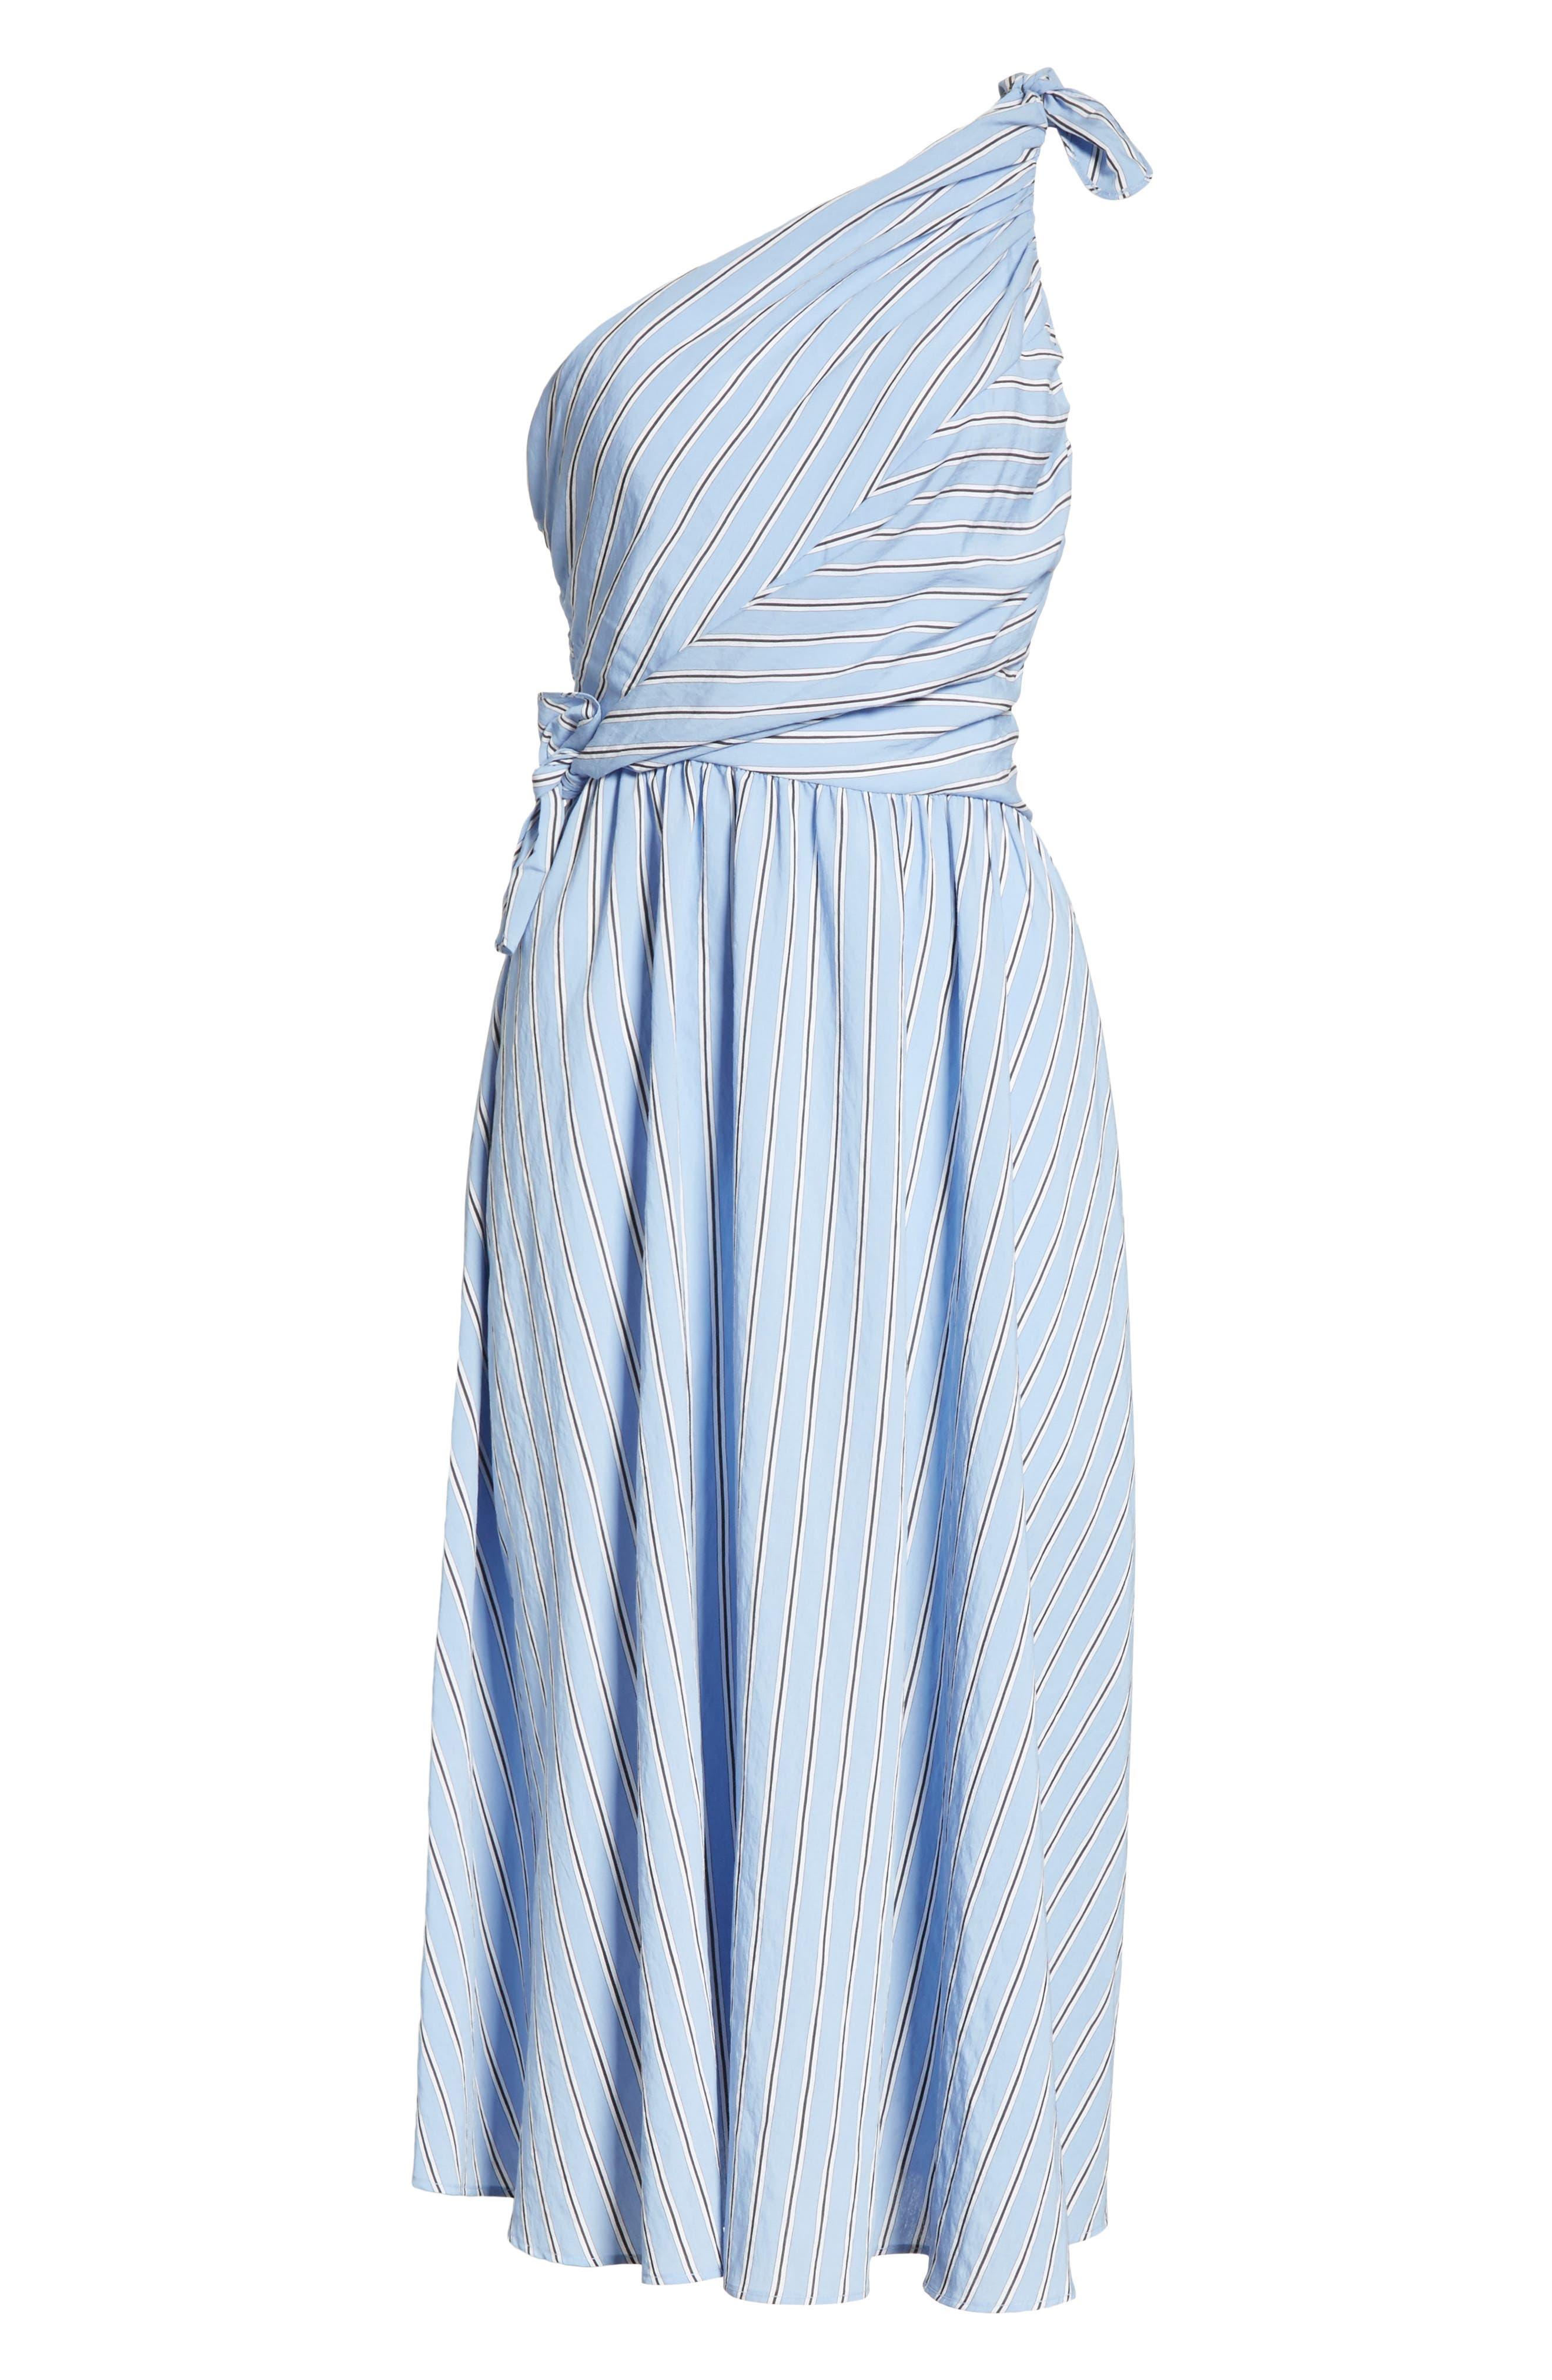 Cabrera Stripe One-Shoulder Dress,                             Alternate thumbnail 7, color,                             420